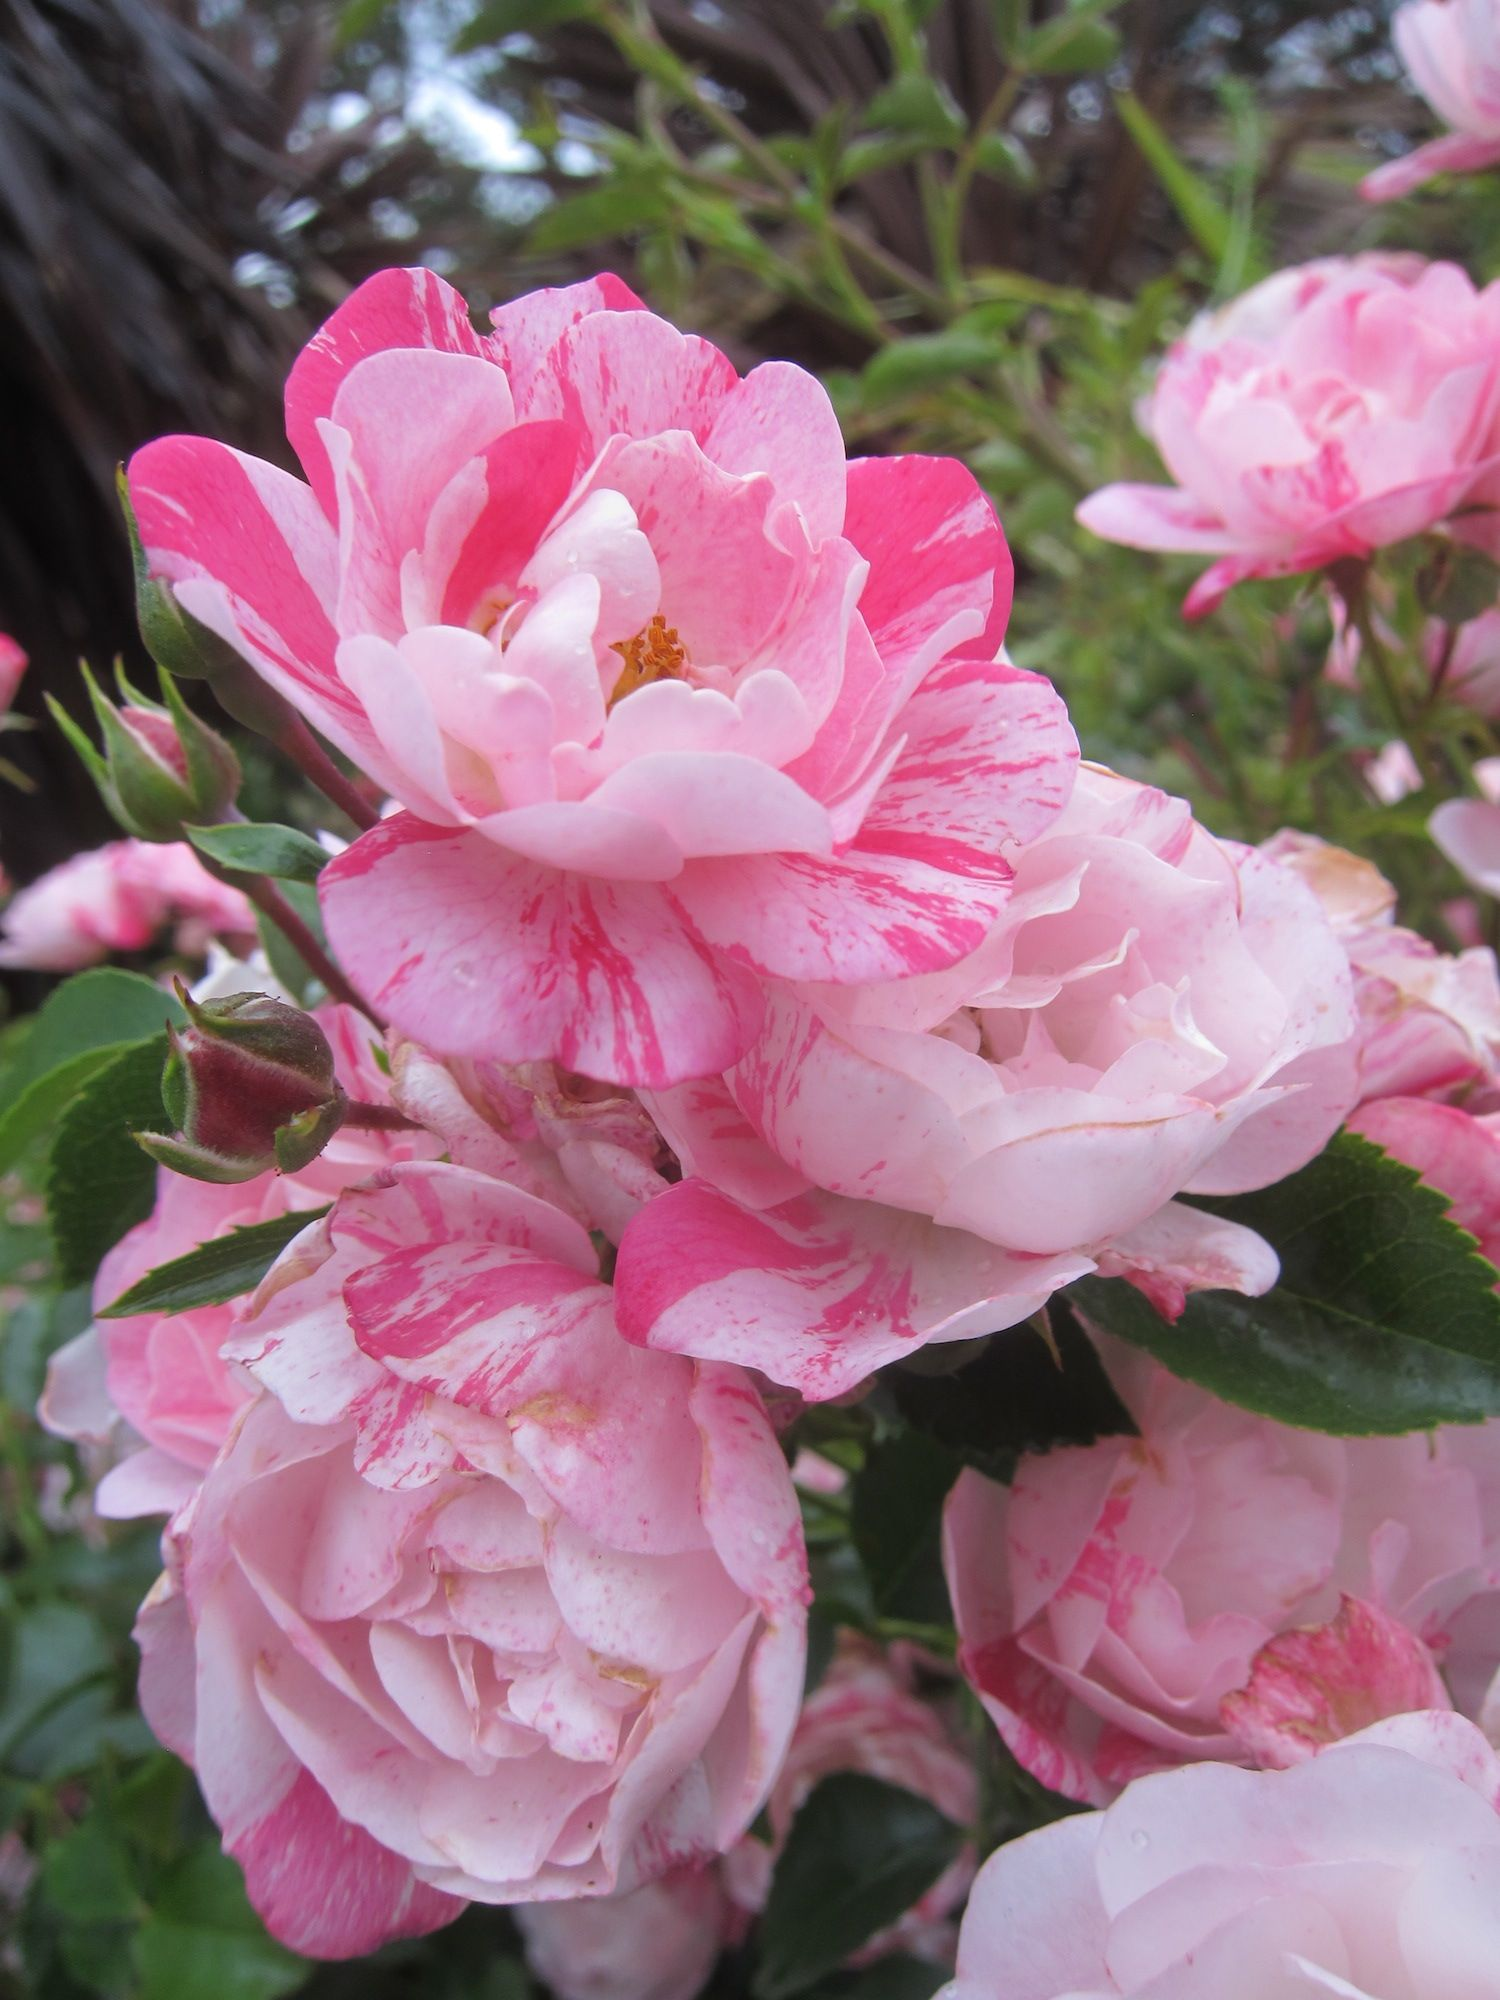 Low Maintenance High Performance Flower Carpet Rose Pink Splash The Perfect Landscape Plant Flowers Rose Plant Care Landscaping With Roses